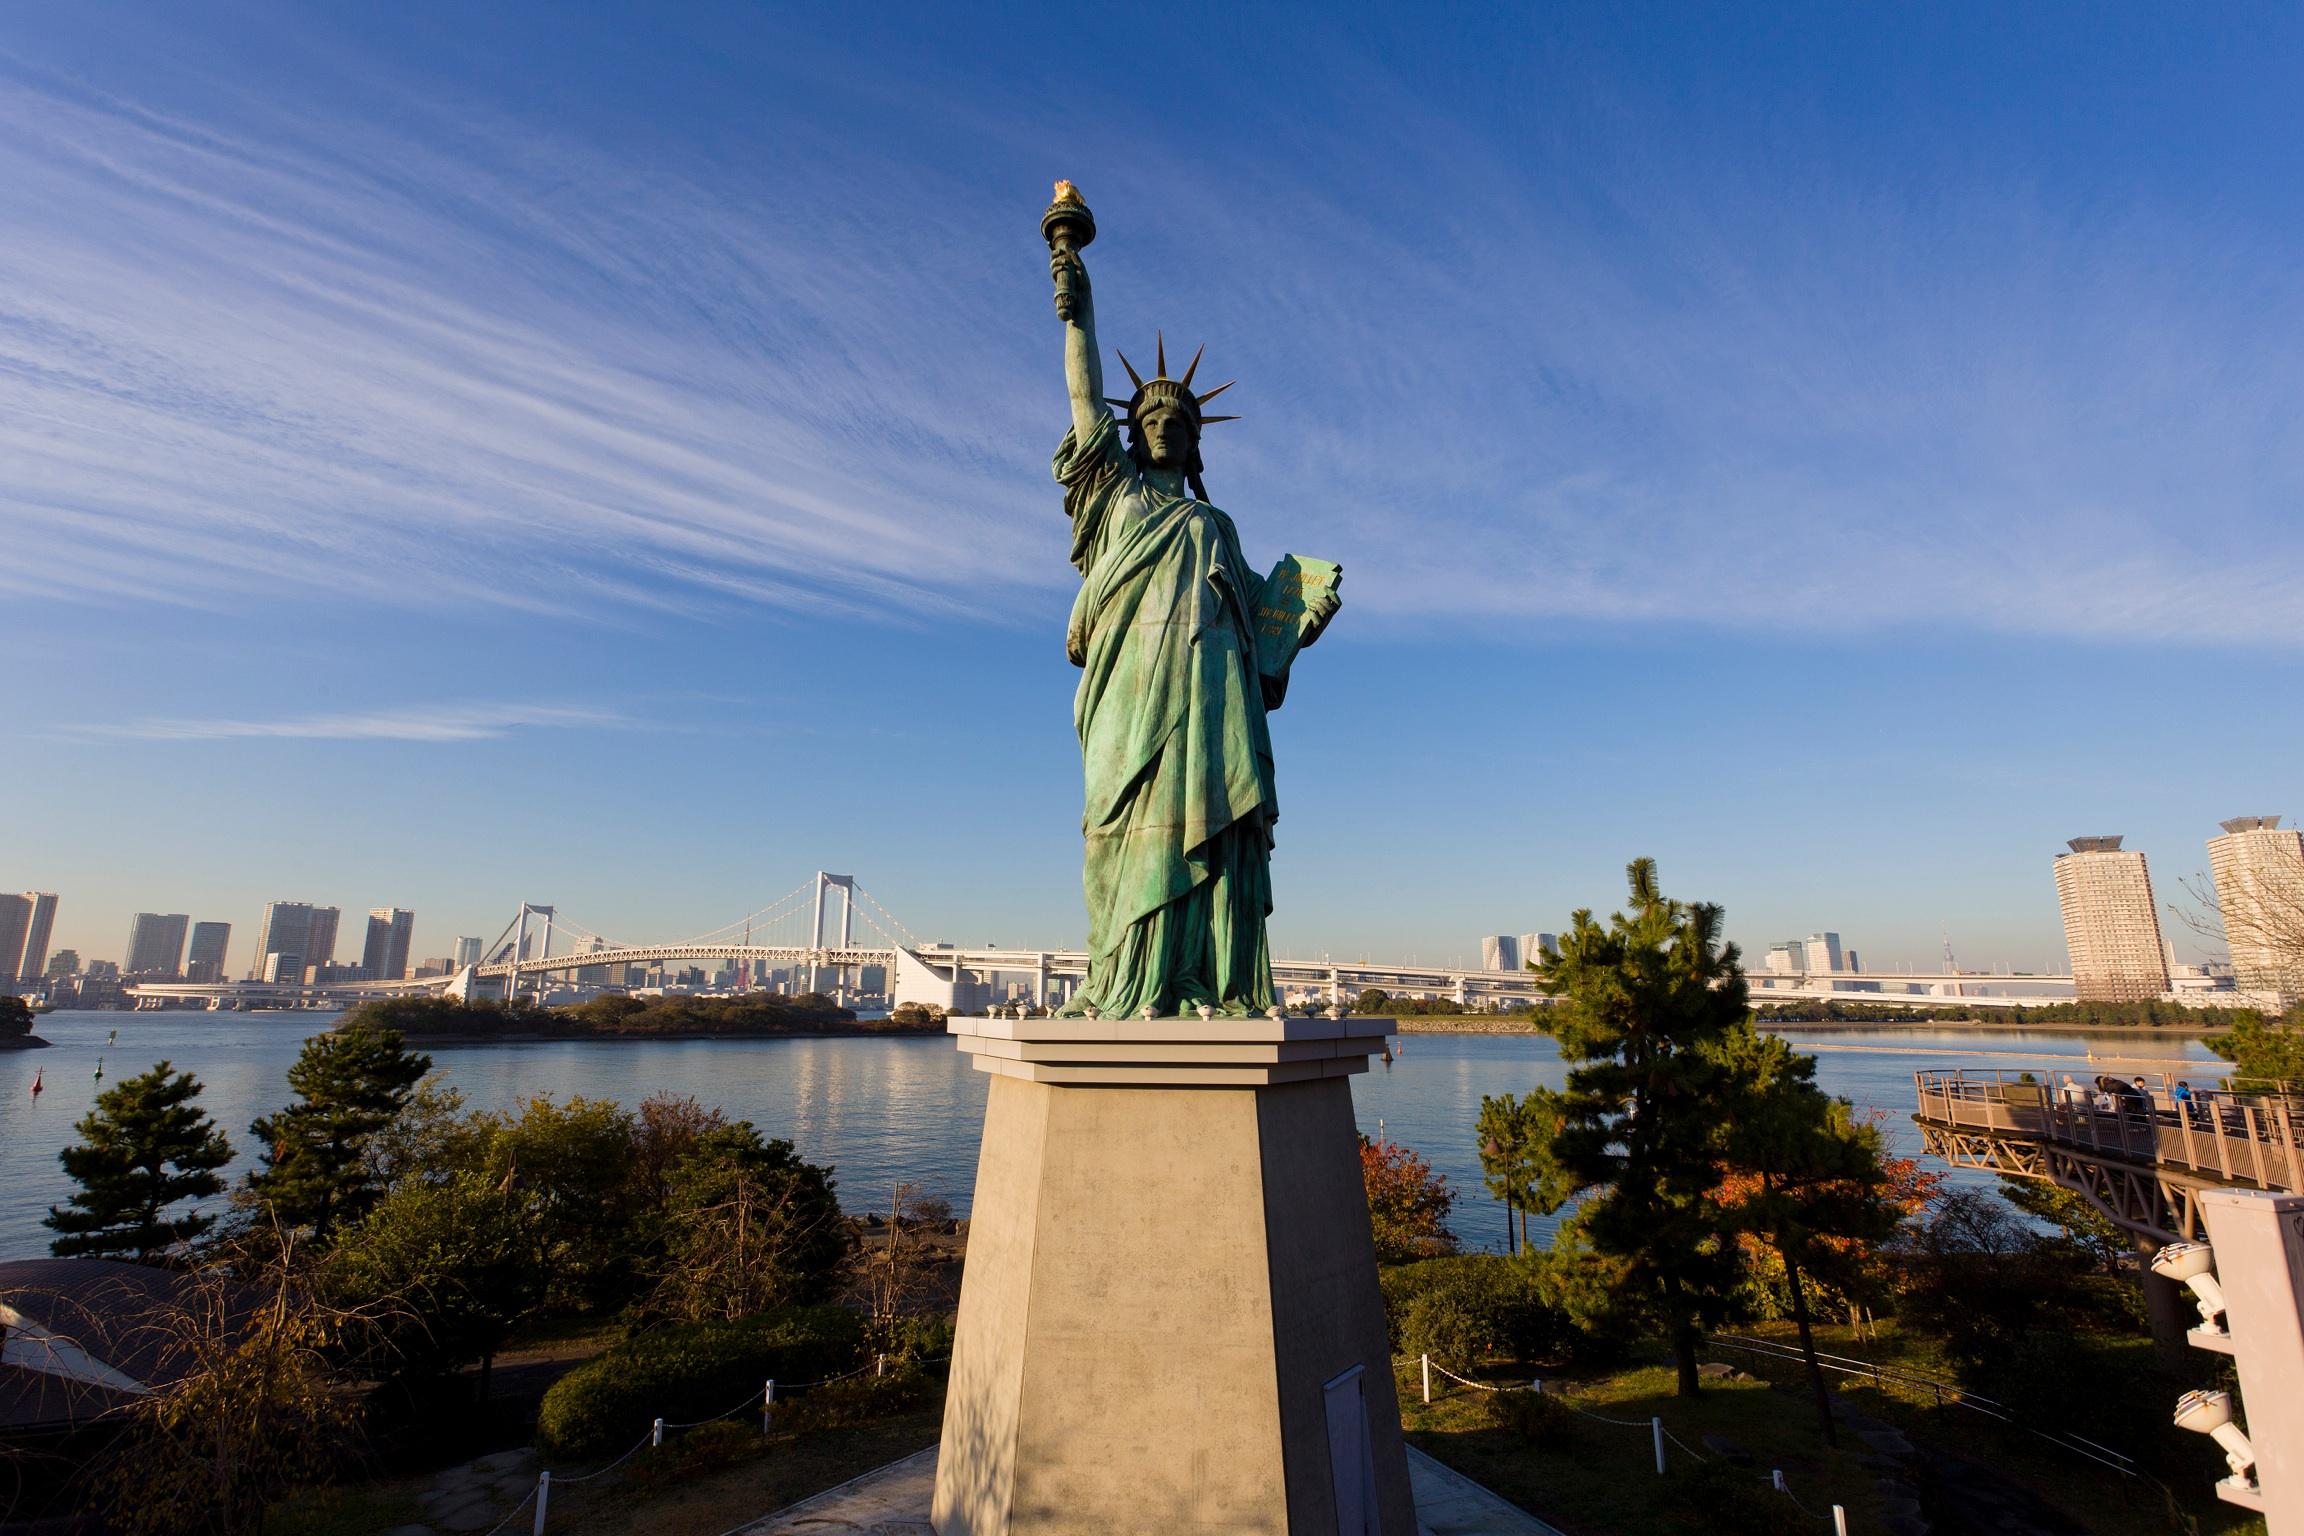 A Statue of Liberty replica in Odaiba, Tokyo